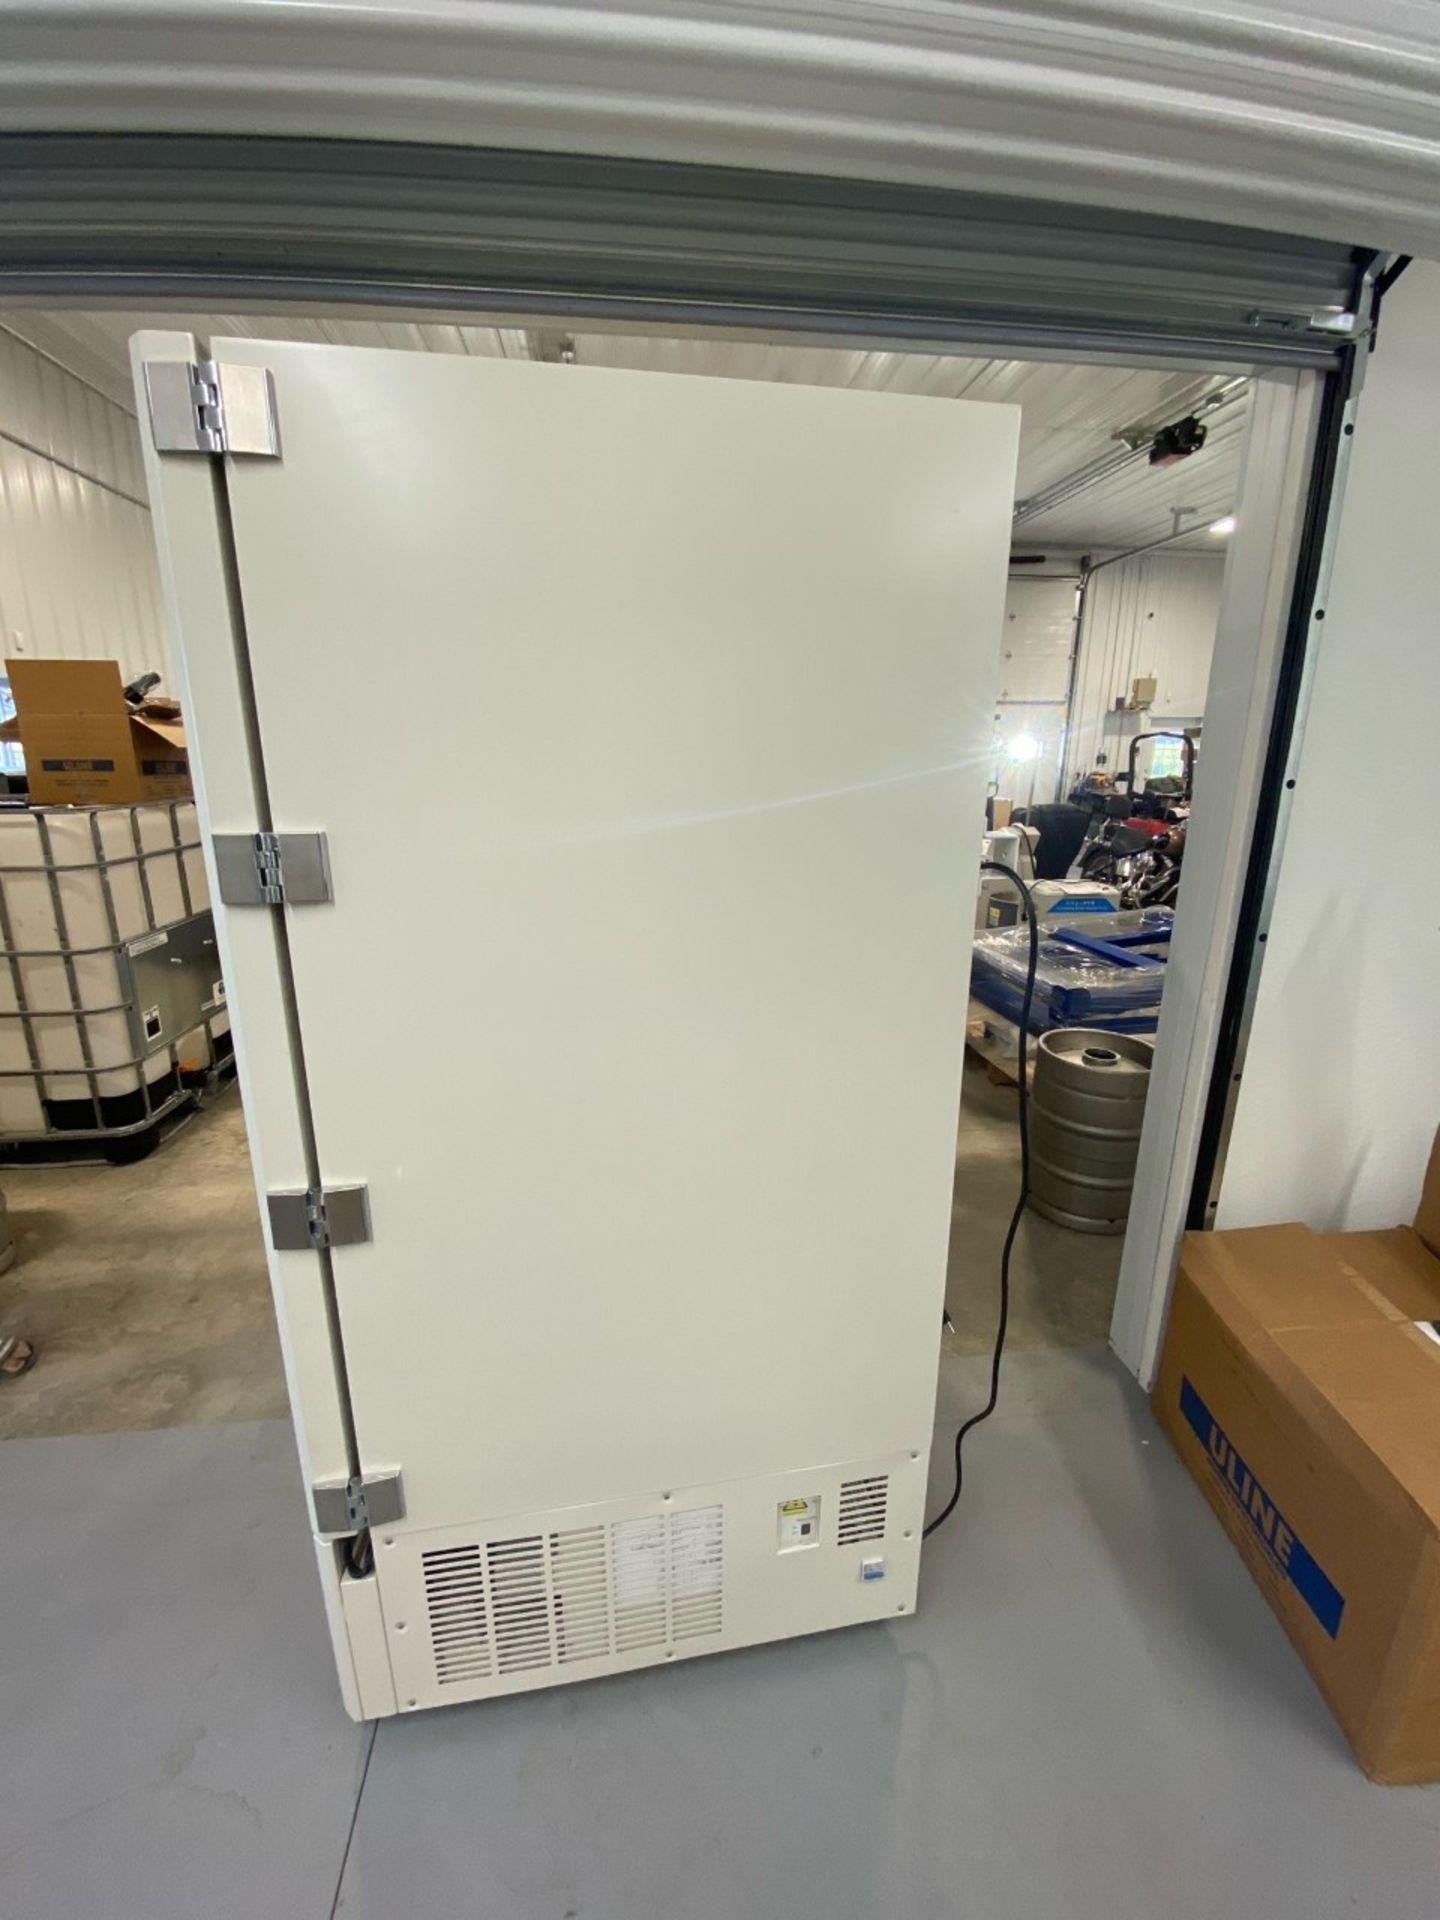 Used AI Glacier 27 CuFt -86C Ultra Low Freezer 110V. Model G27. TempRange: -40 to -86 Degrees C. - Image 3 of 8